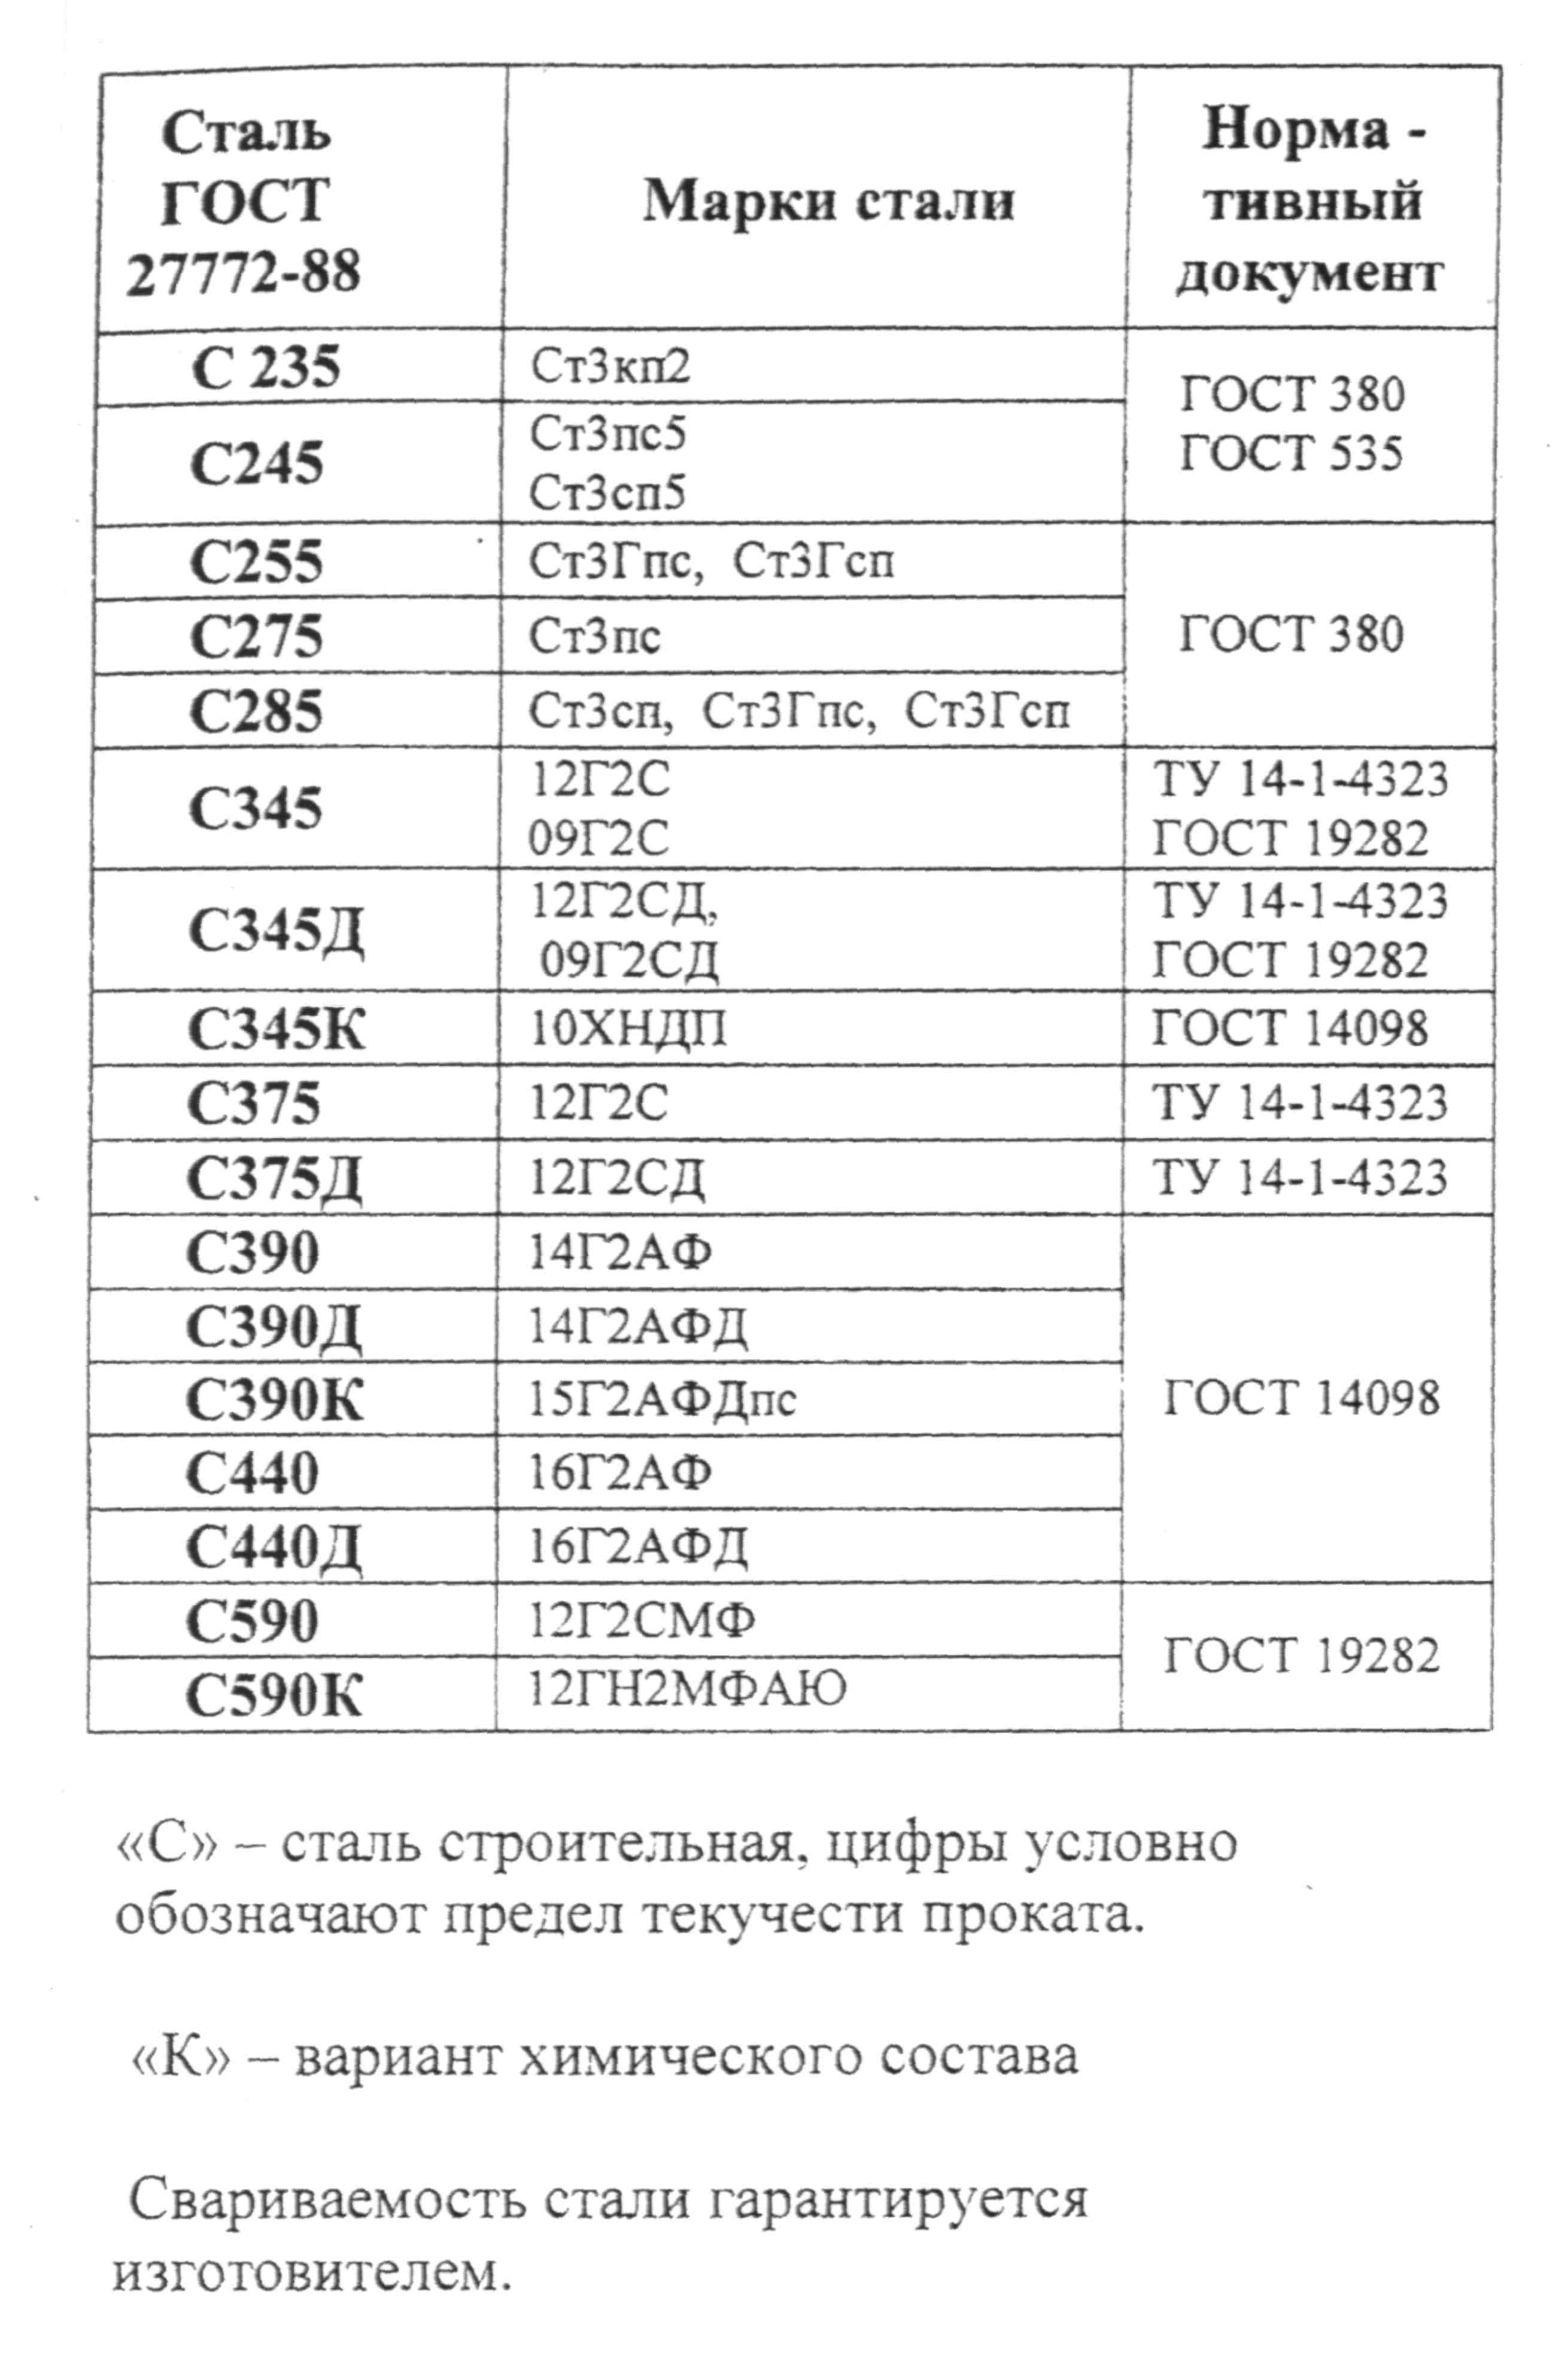 Сталь с255: расшифровка марки, аналог, гост, характеристики